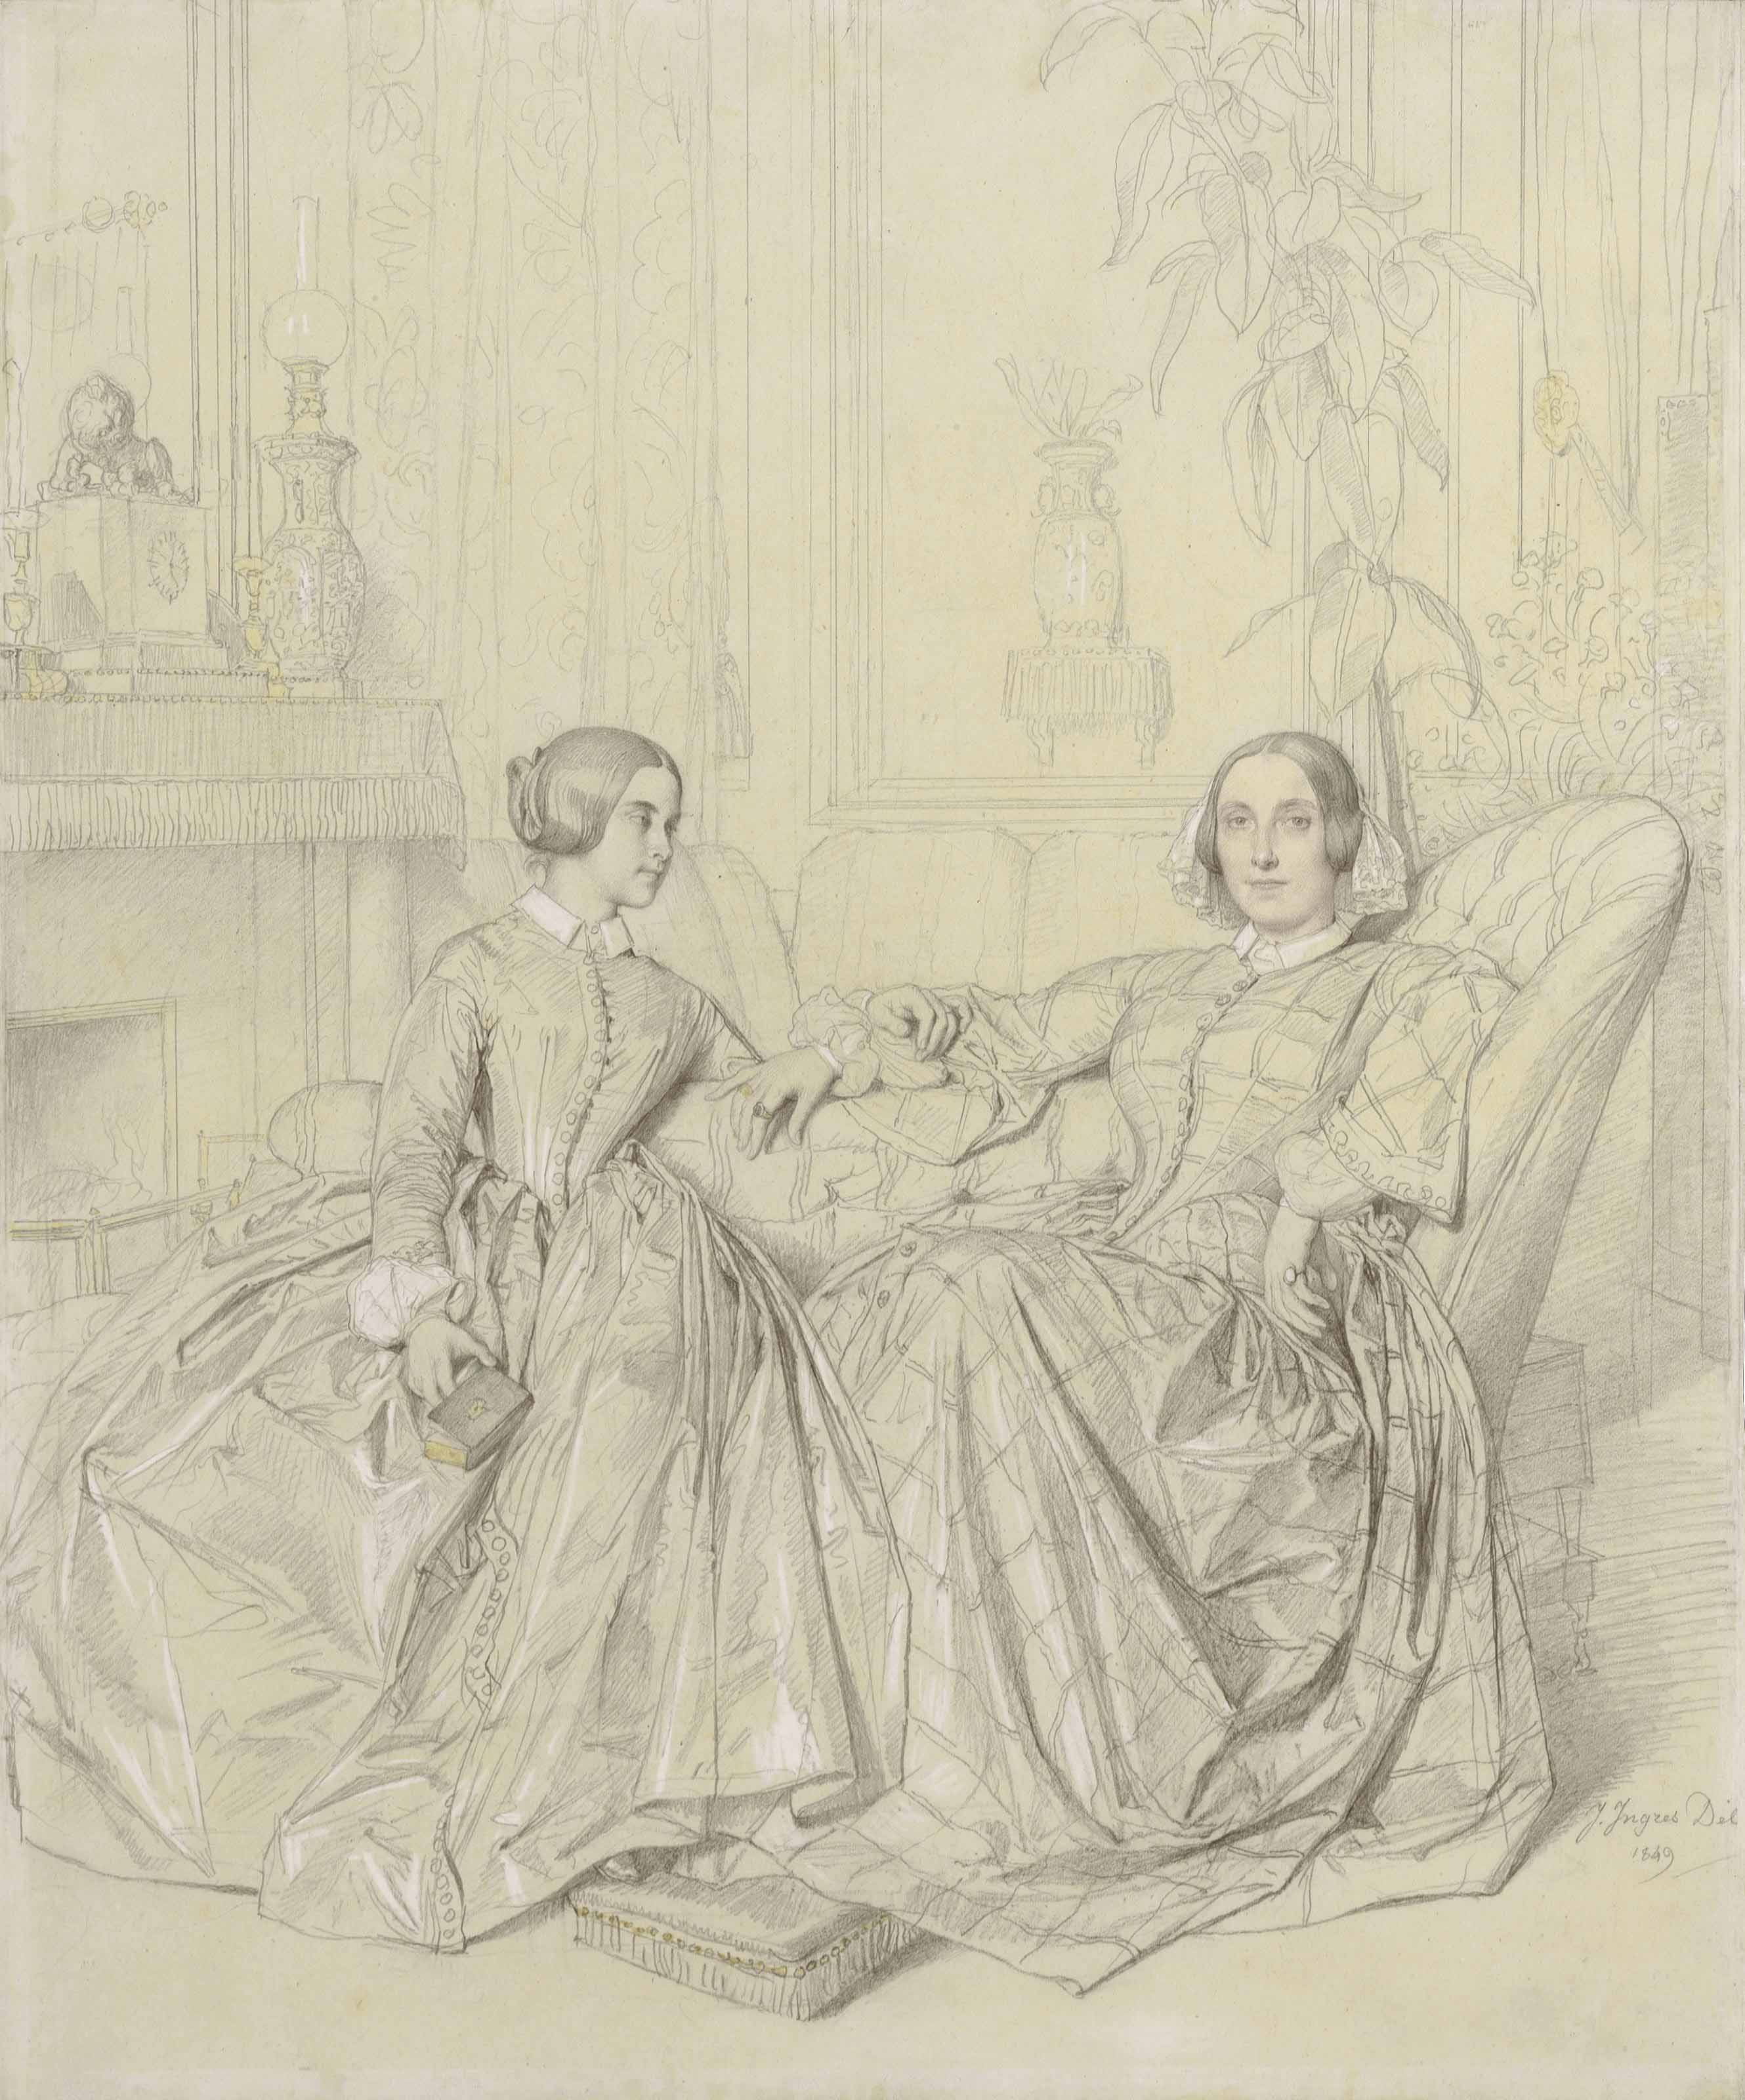 Comtesse Charles d'Agoult, née Marie d'Agoult, and her daughter Claire d'Agoult